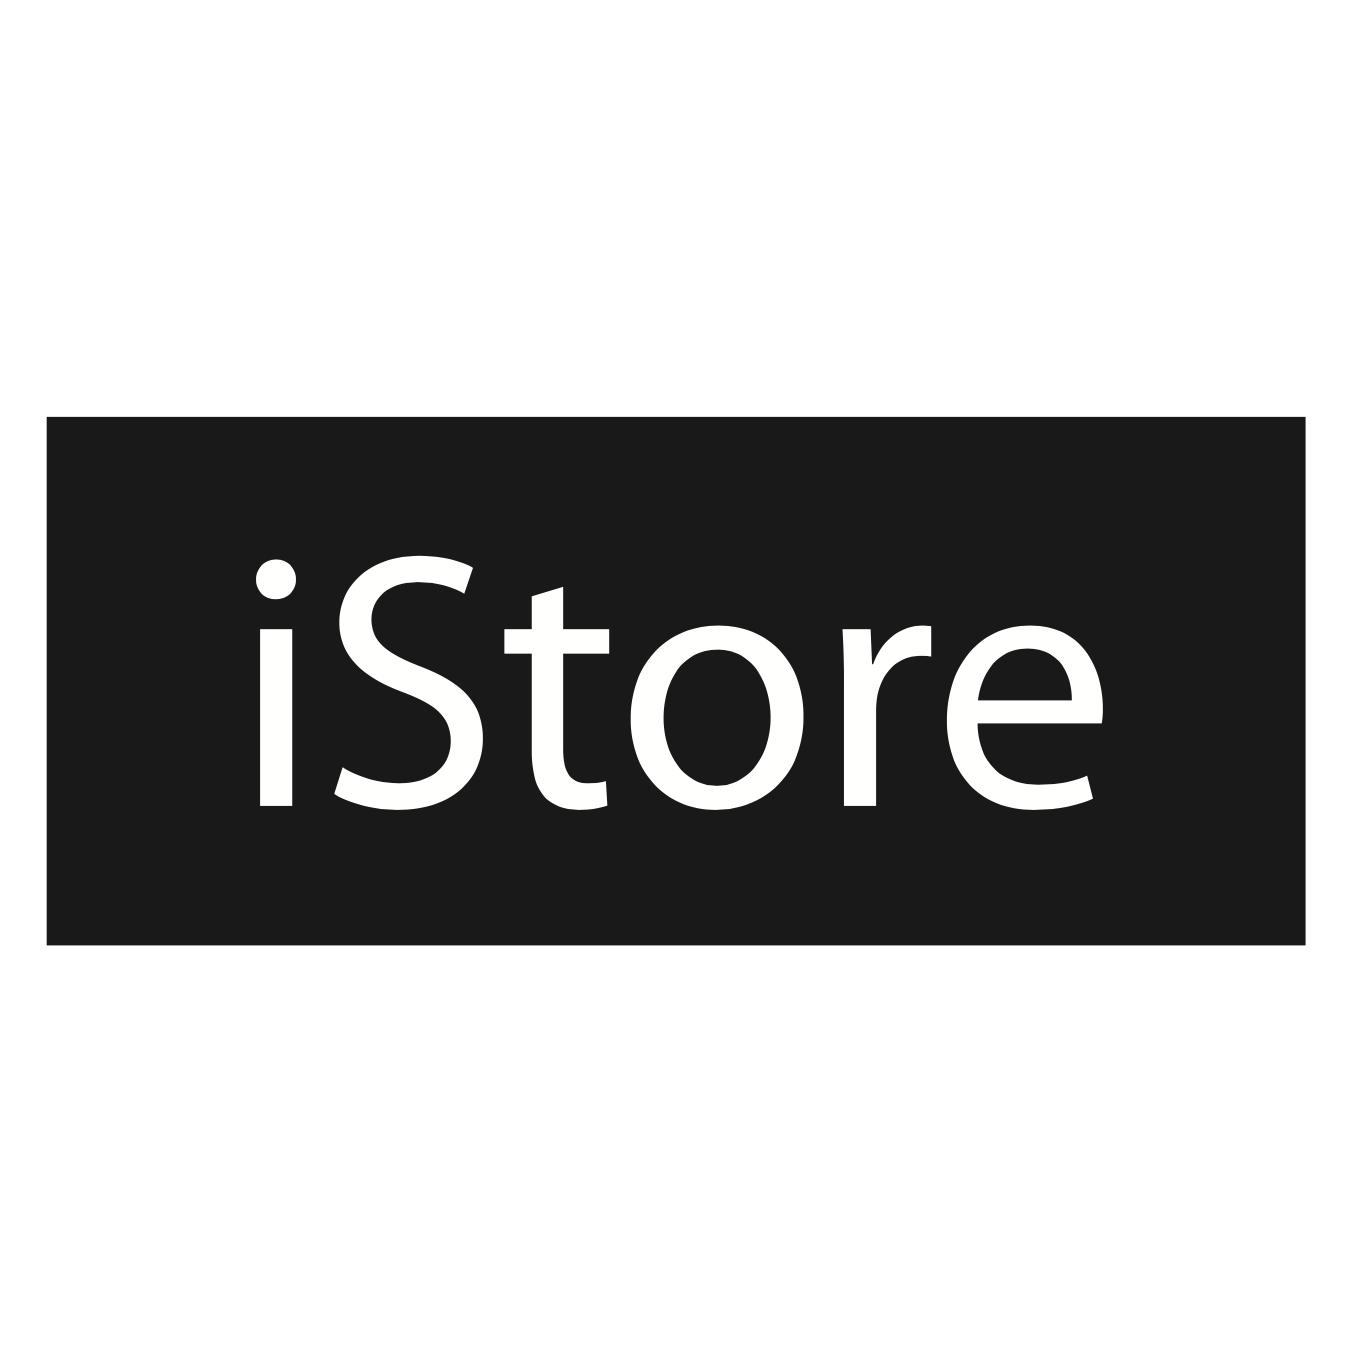 Incase Neoprene Classic Sleeve for iPad Pro 12.9-inch - Black